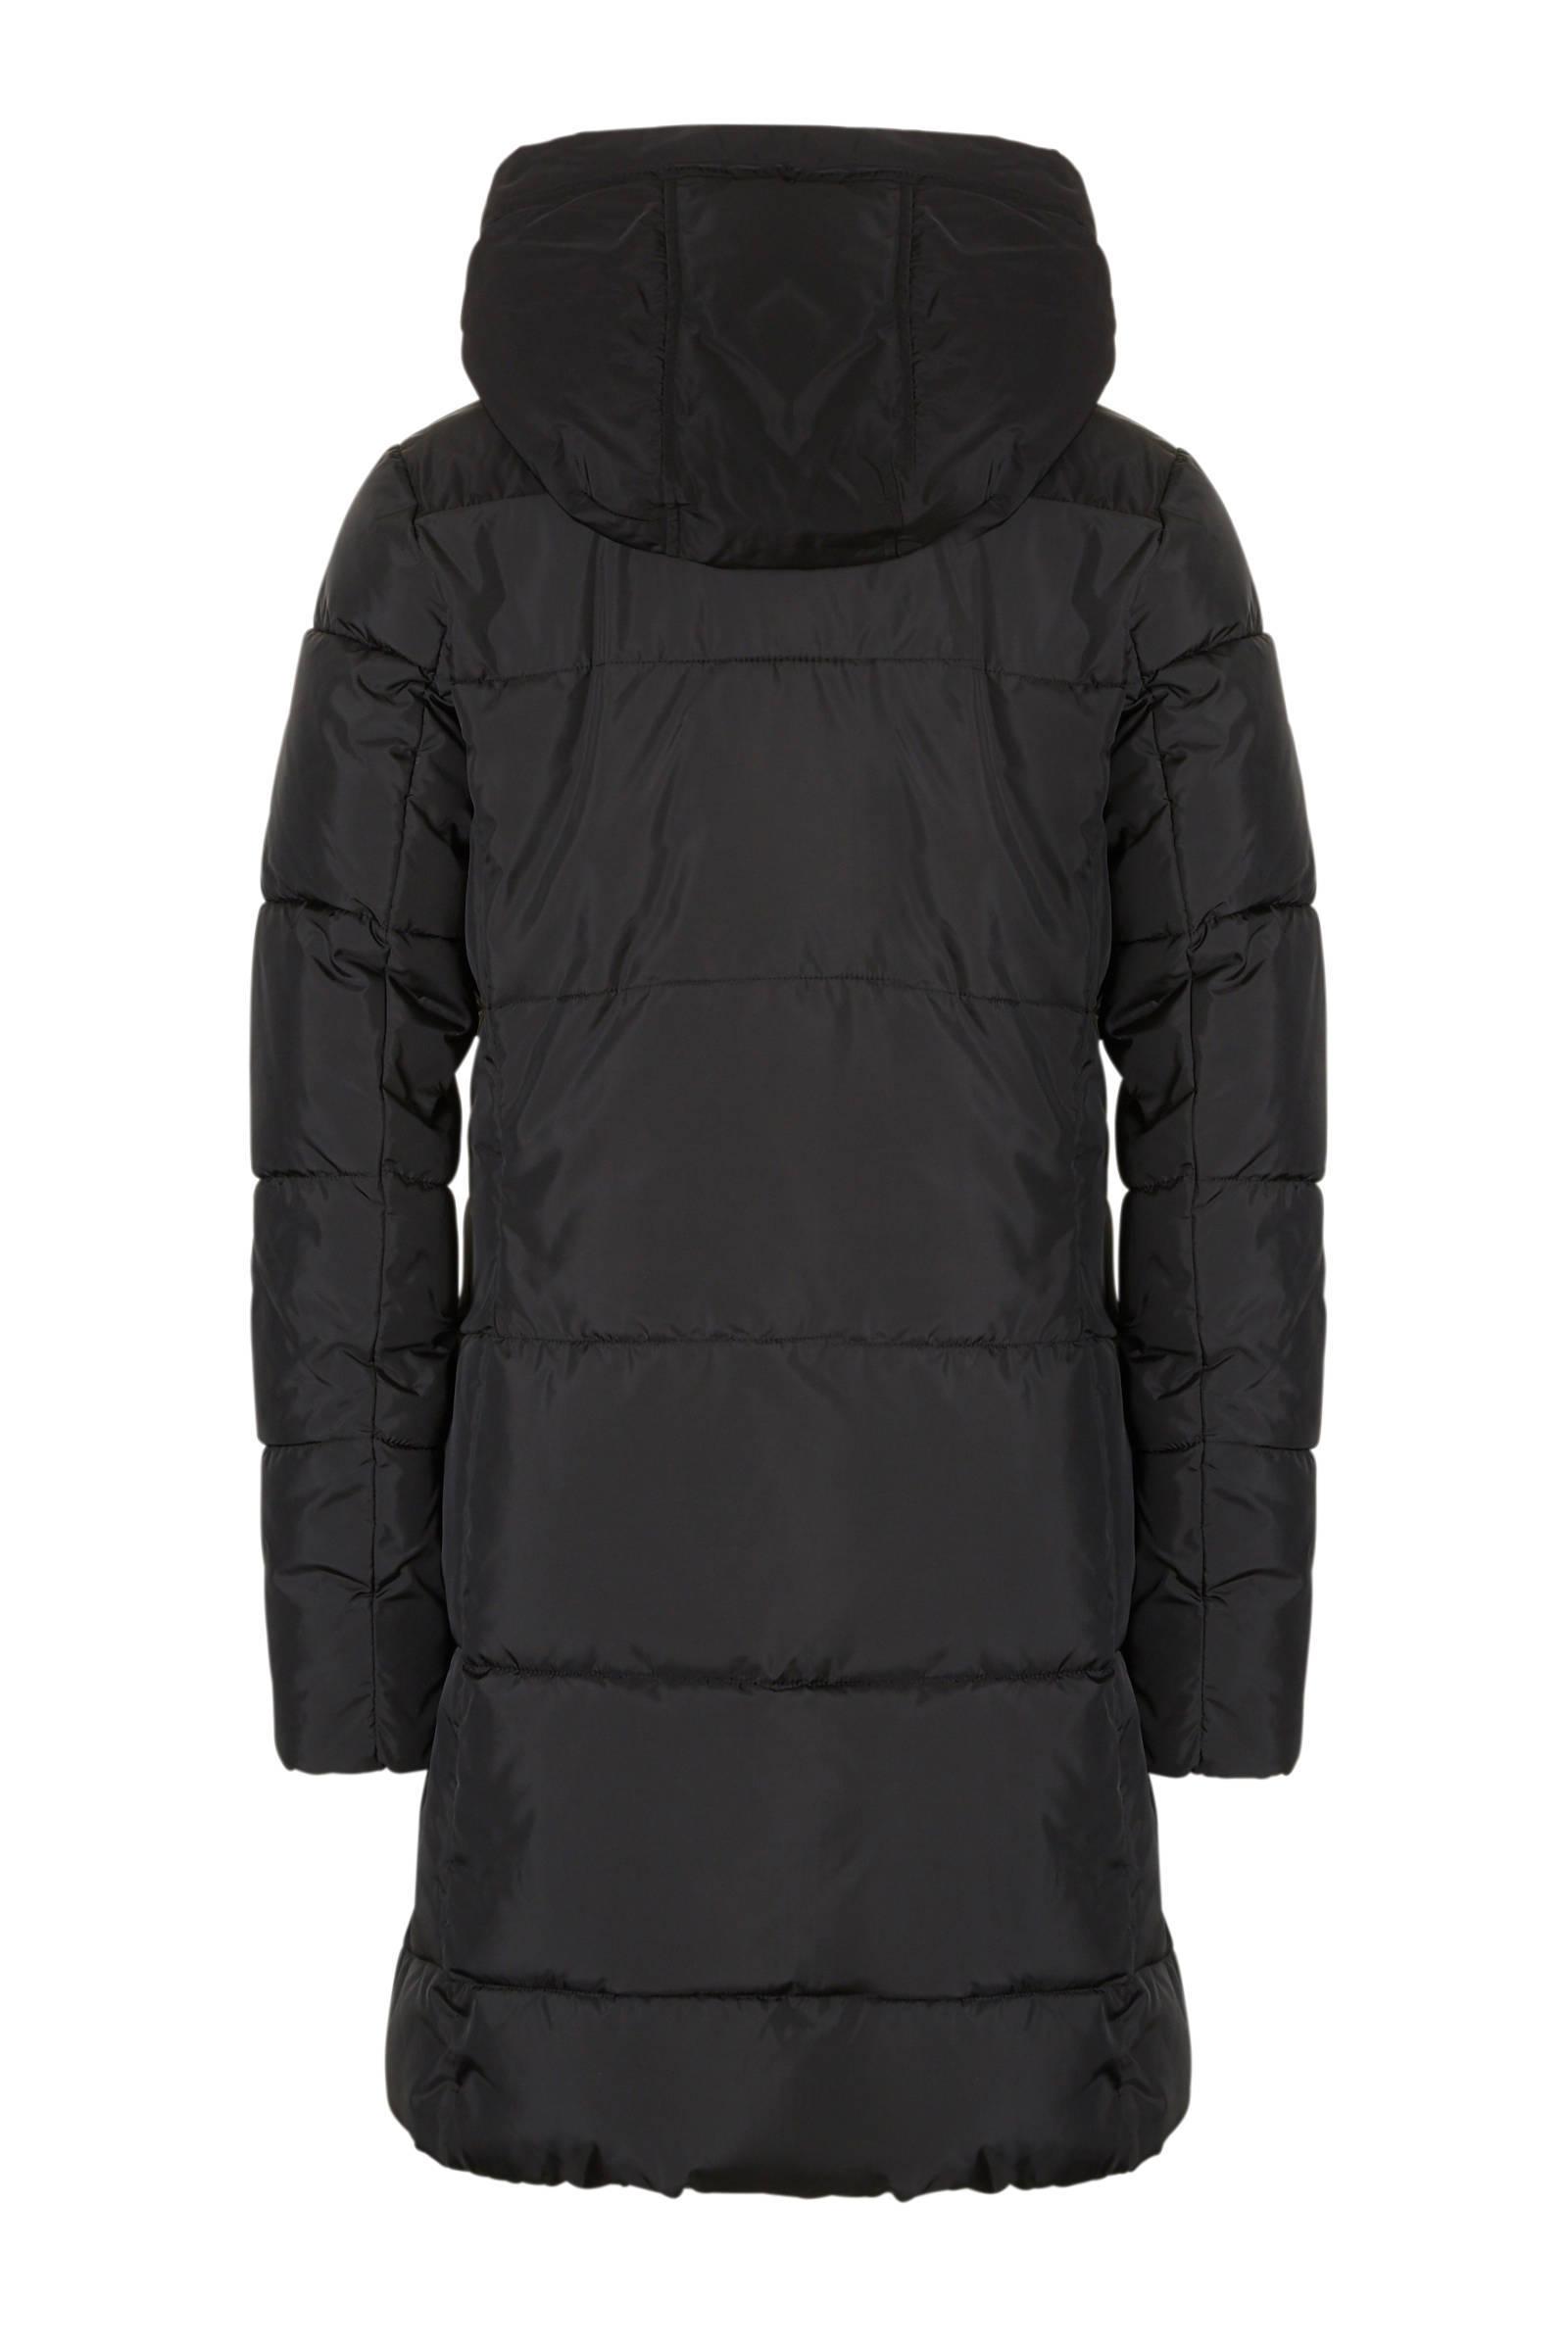 Fonkelnieuw G-Star RAW Whistler jas | wehkamp TY-79